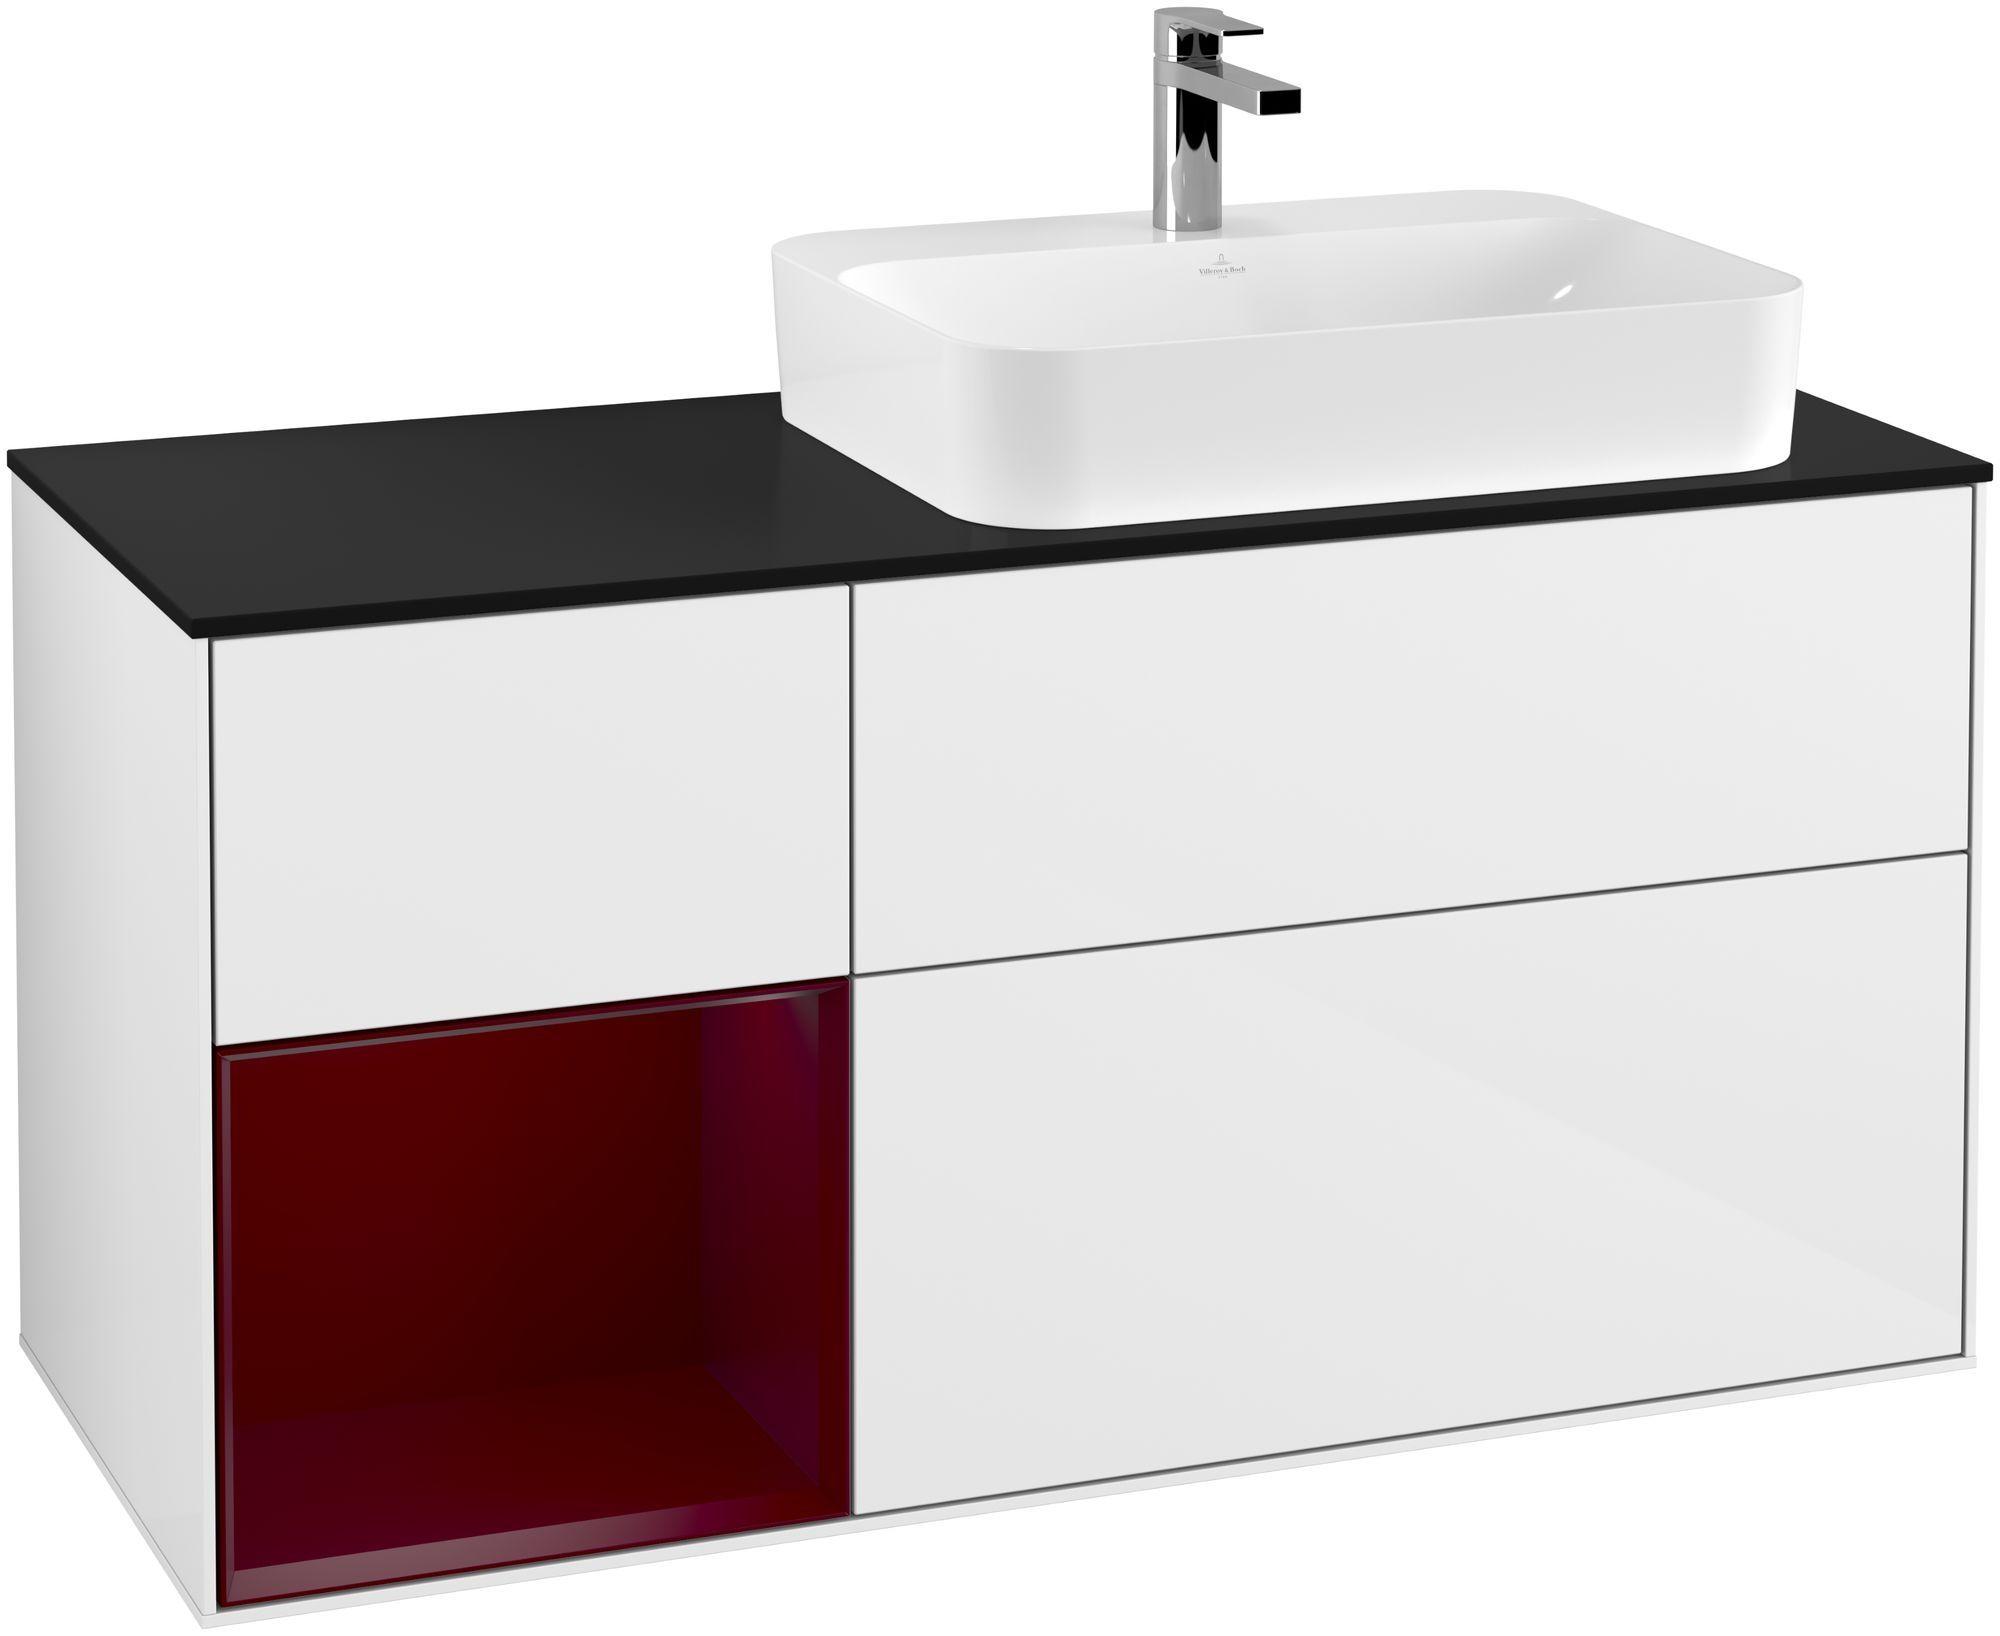 Villeroy & Boch Finion G39 Waschtischunterschrank mit Regalelement 3 Auszüge Waschtisch rechts LED-Beleuchtung B:120xH:60,3xT:50,1cm Front, Korpus: Glossy White Lack, Regal: Peony, Glasplatte: Black Matt G392HBGF